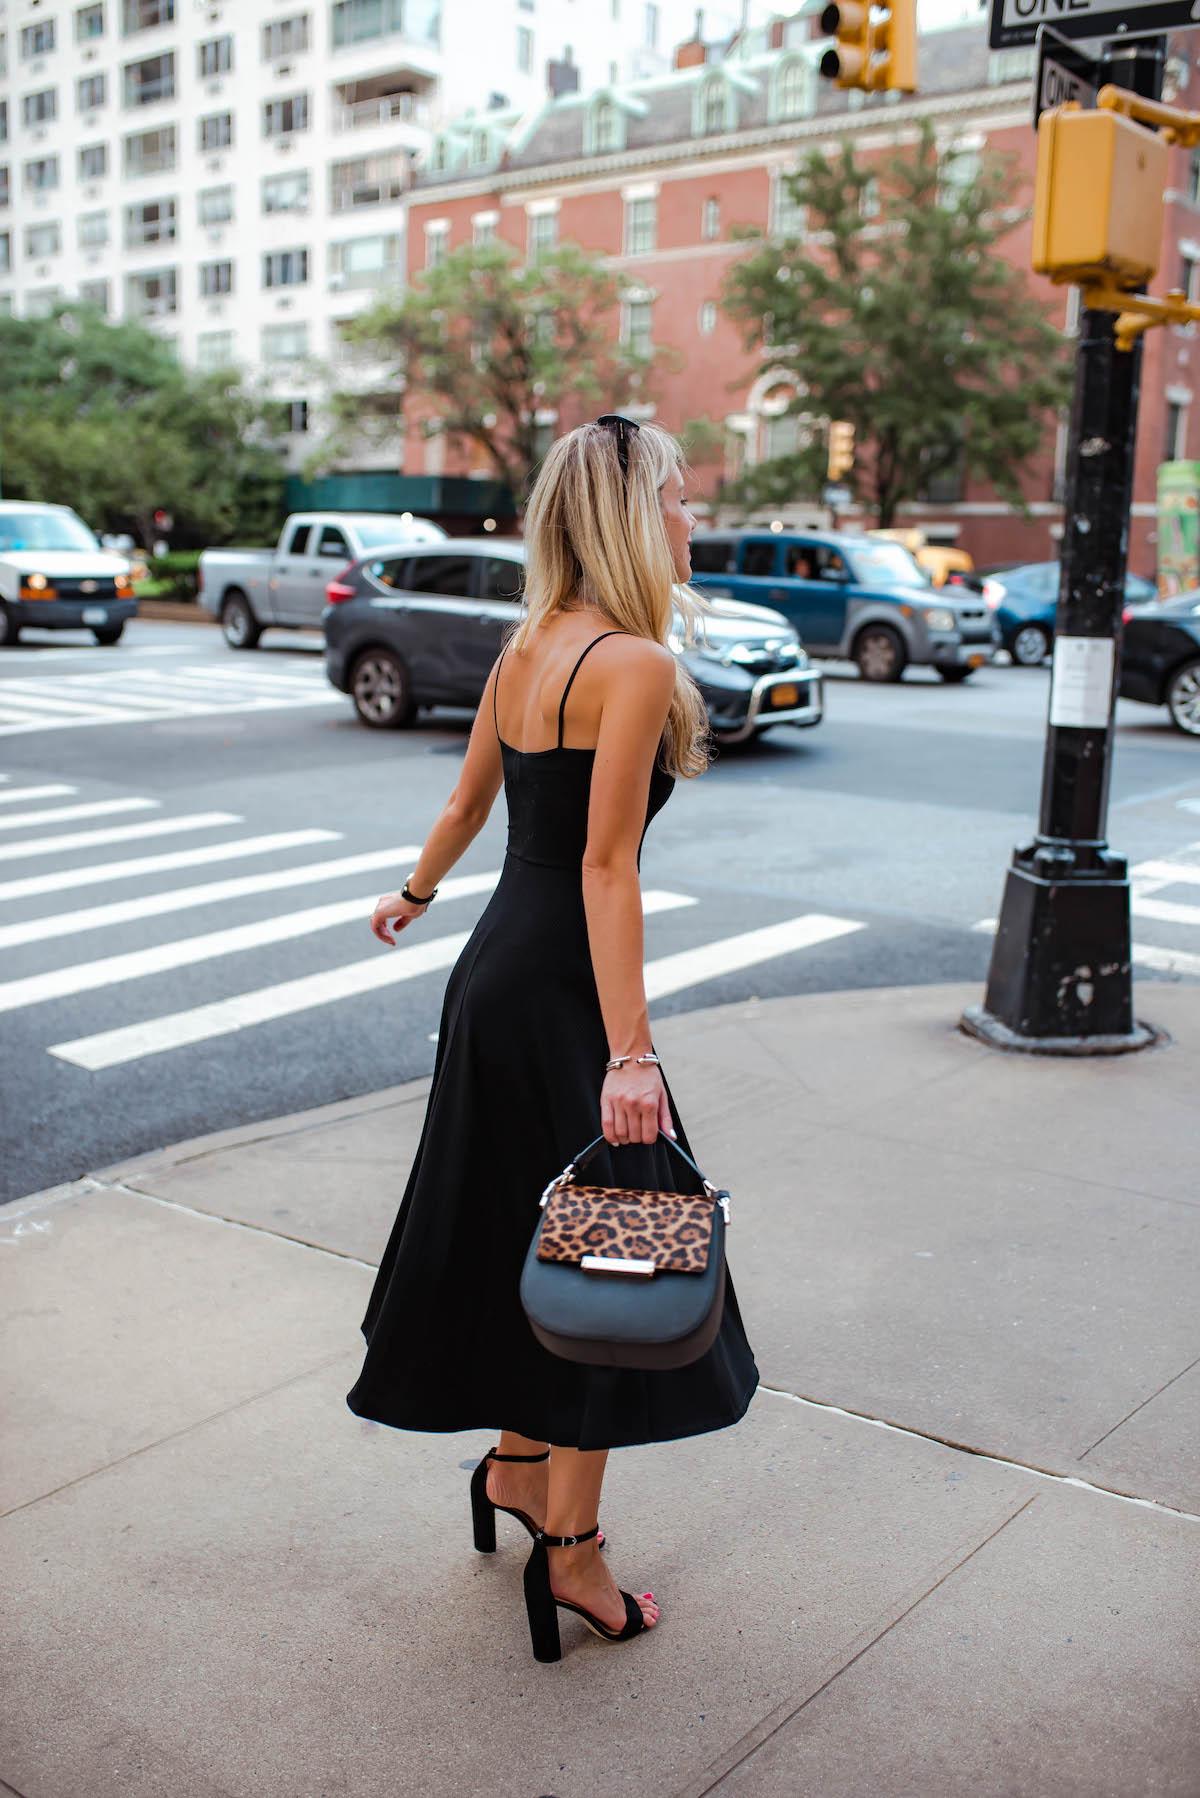 b8f846db7cdc 2 Dress Looks On The Upper East Side